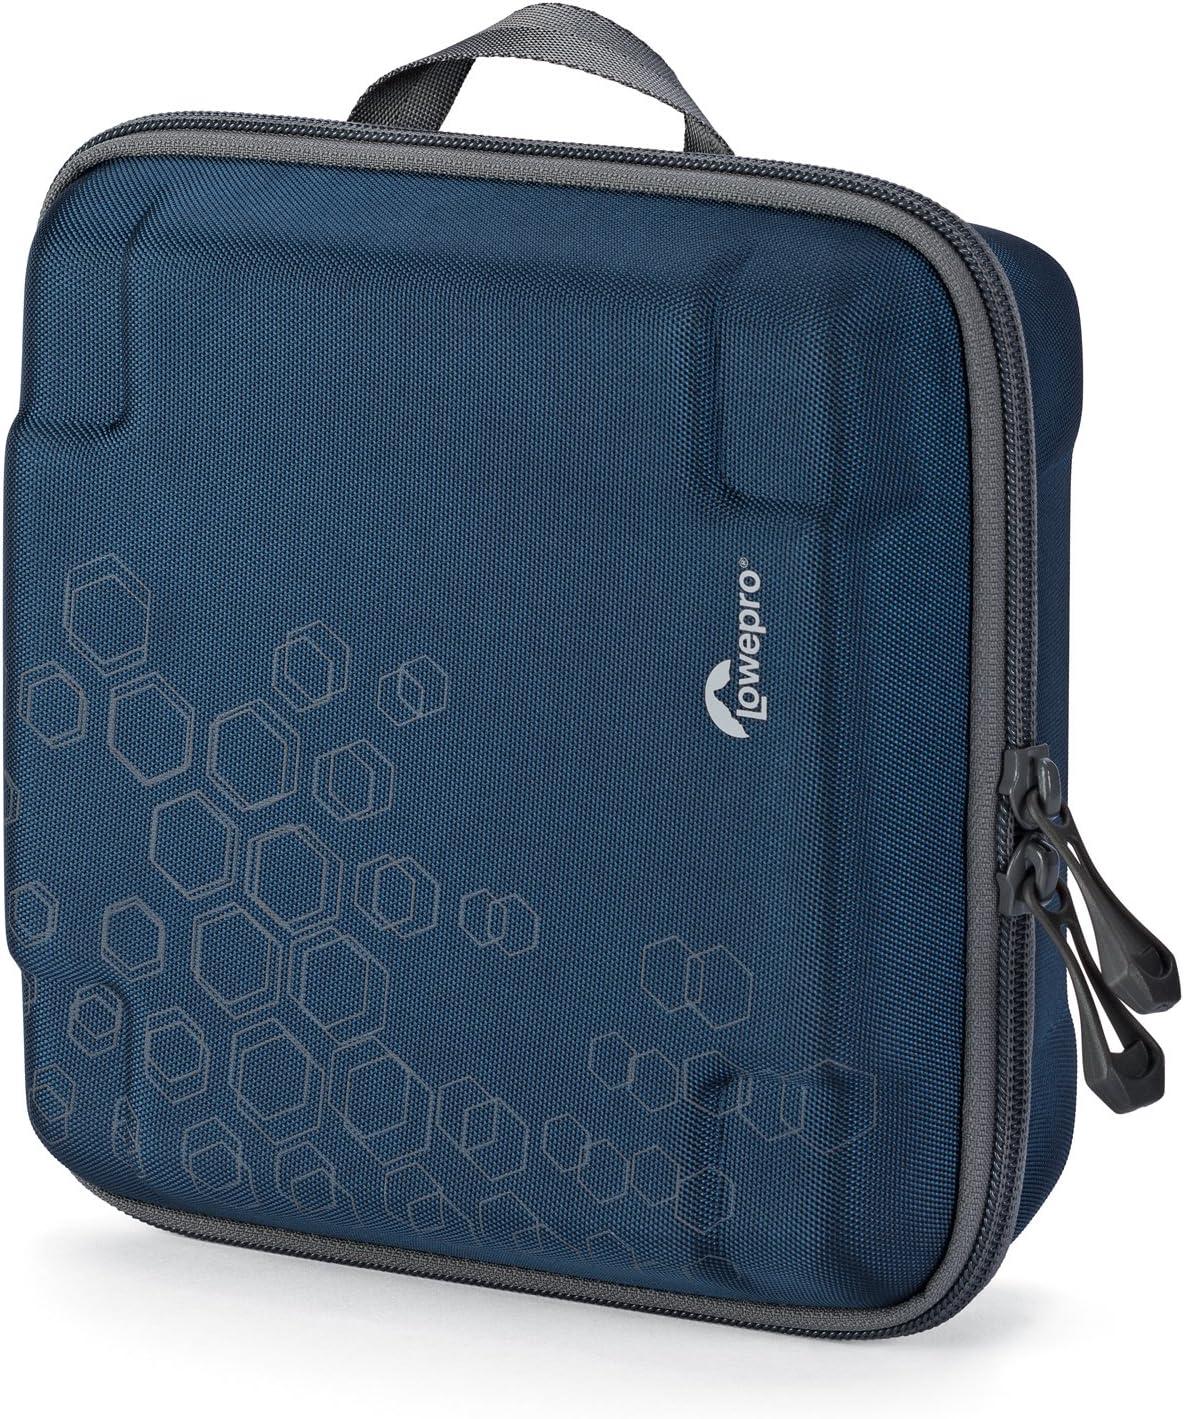 Lowepro Dashpoint Dashpoint AVC 2 Galaxy Blue